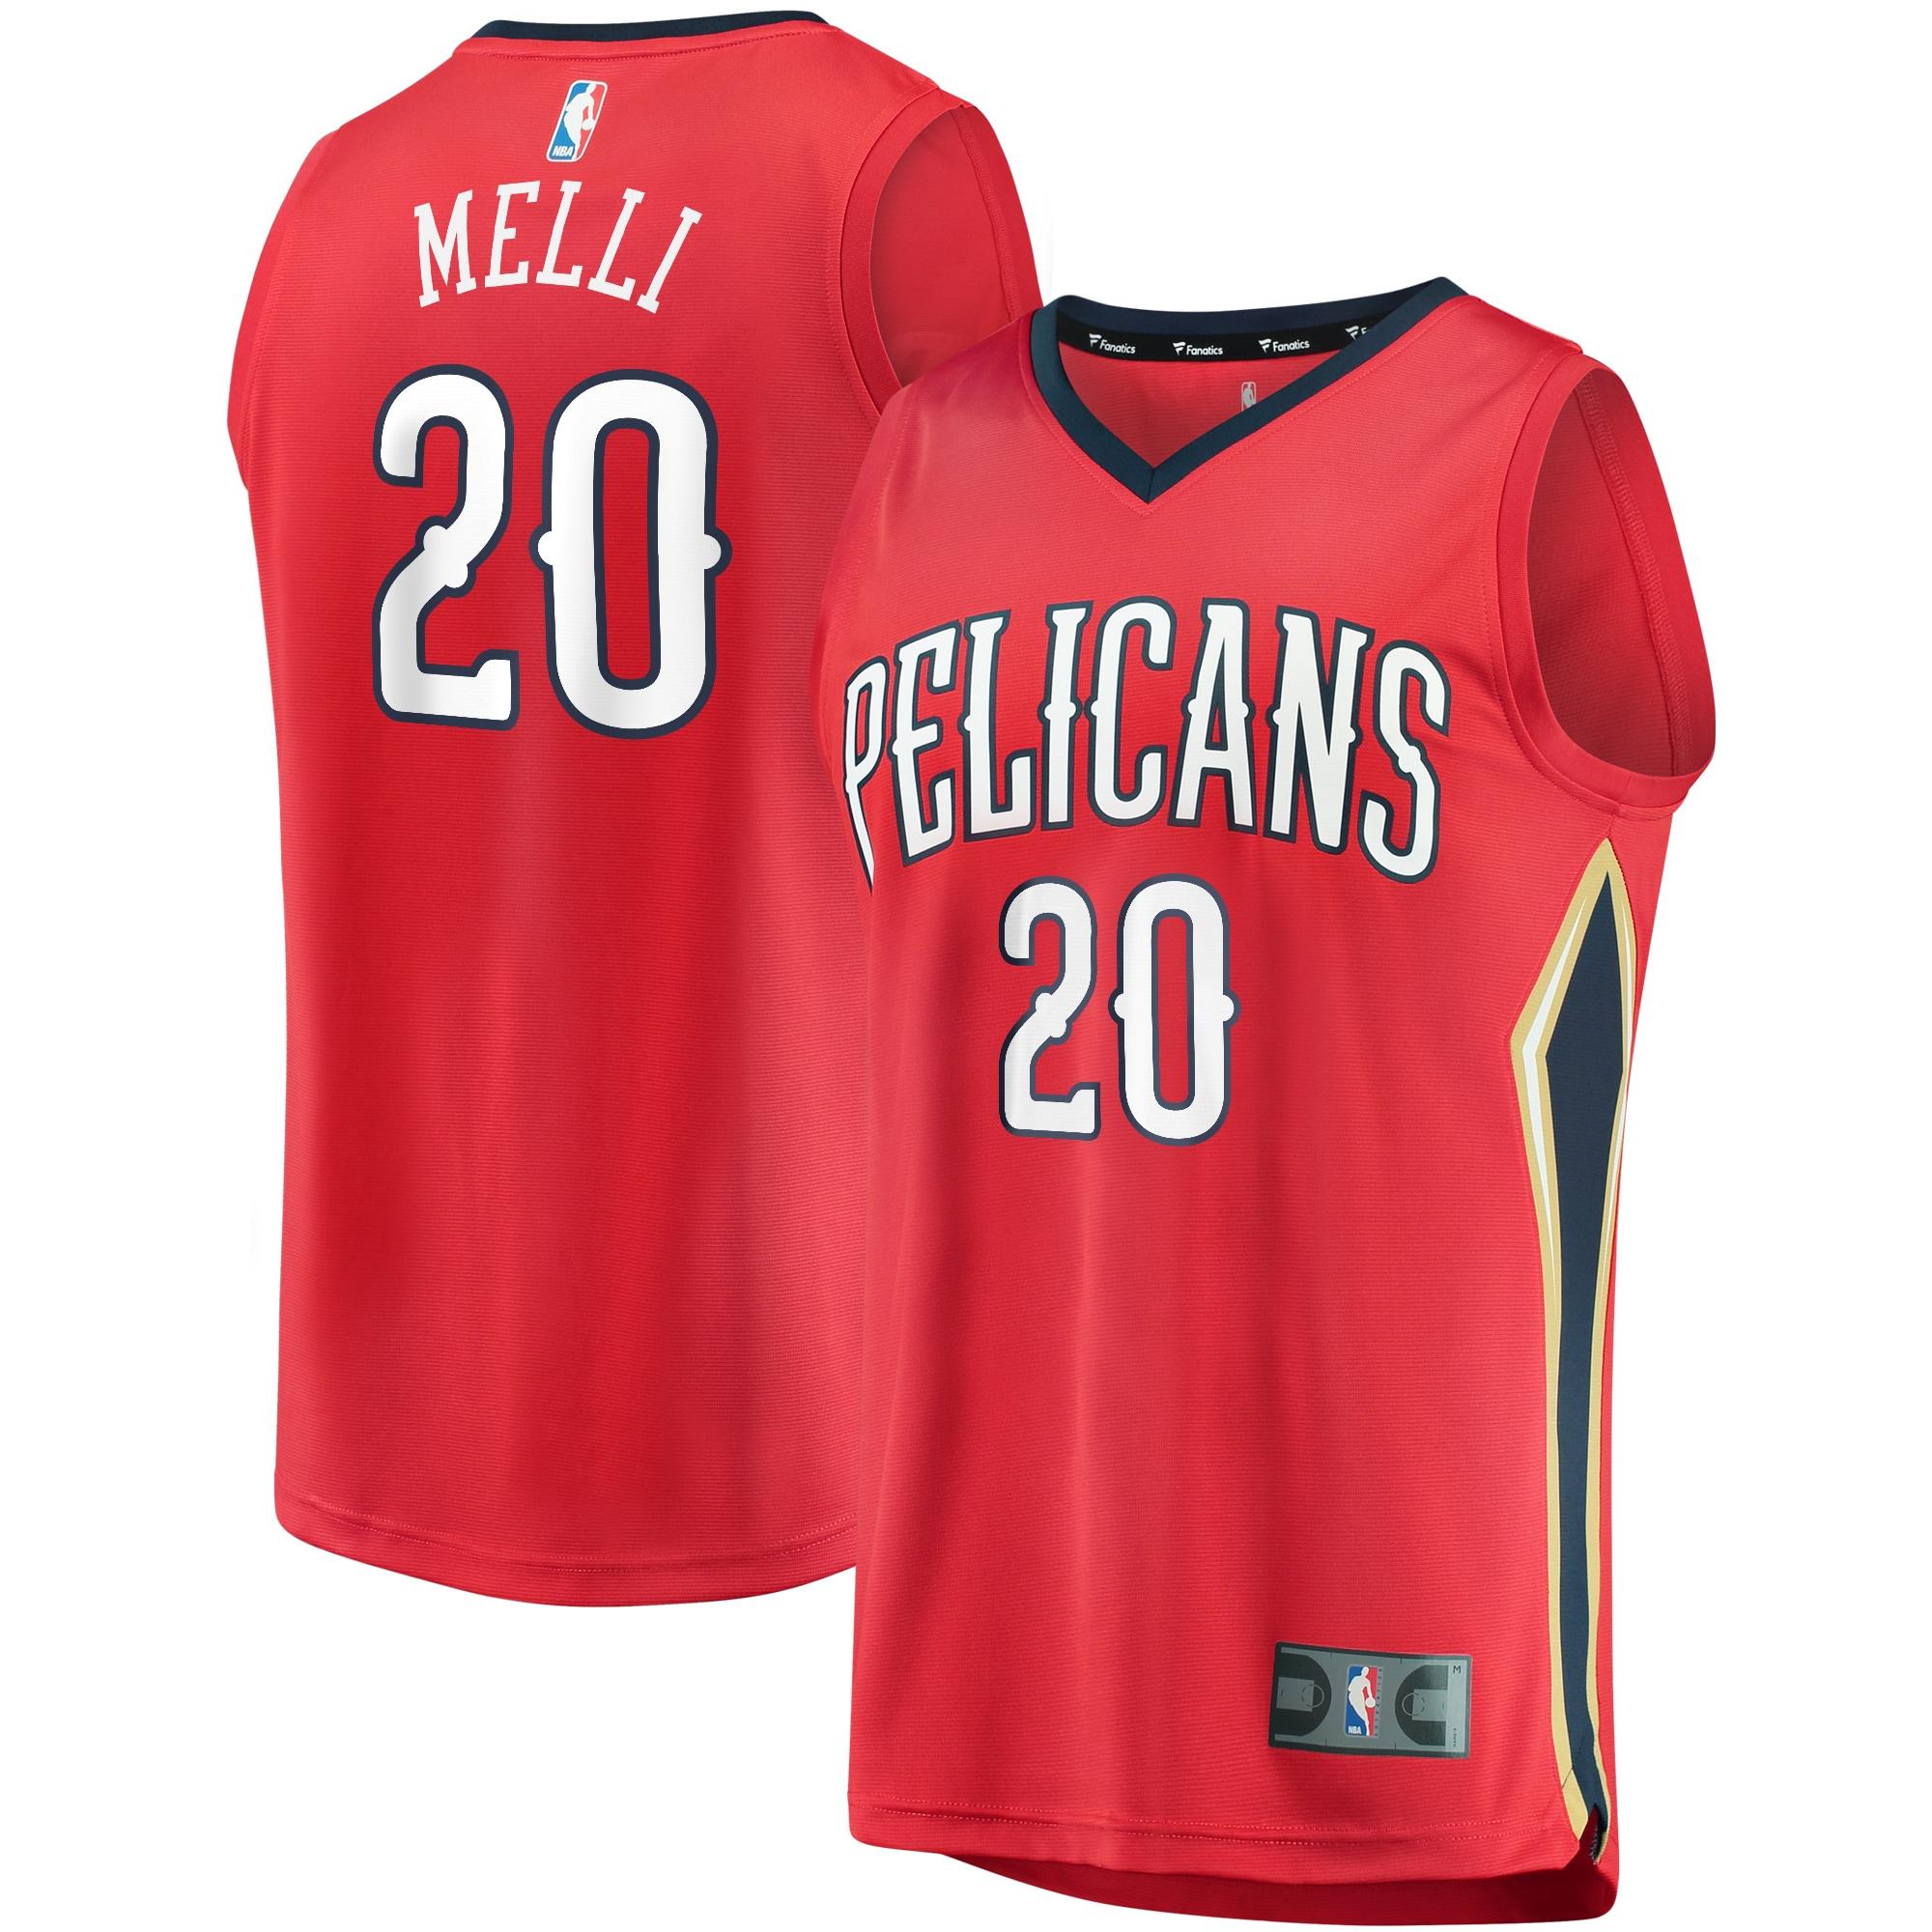 Nicolo Melli New Orleans Pelicans Fanatics Branded Fast Break Replica Player Jersey Red - Statement Edition